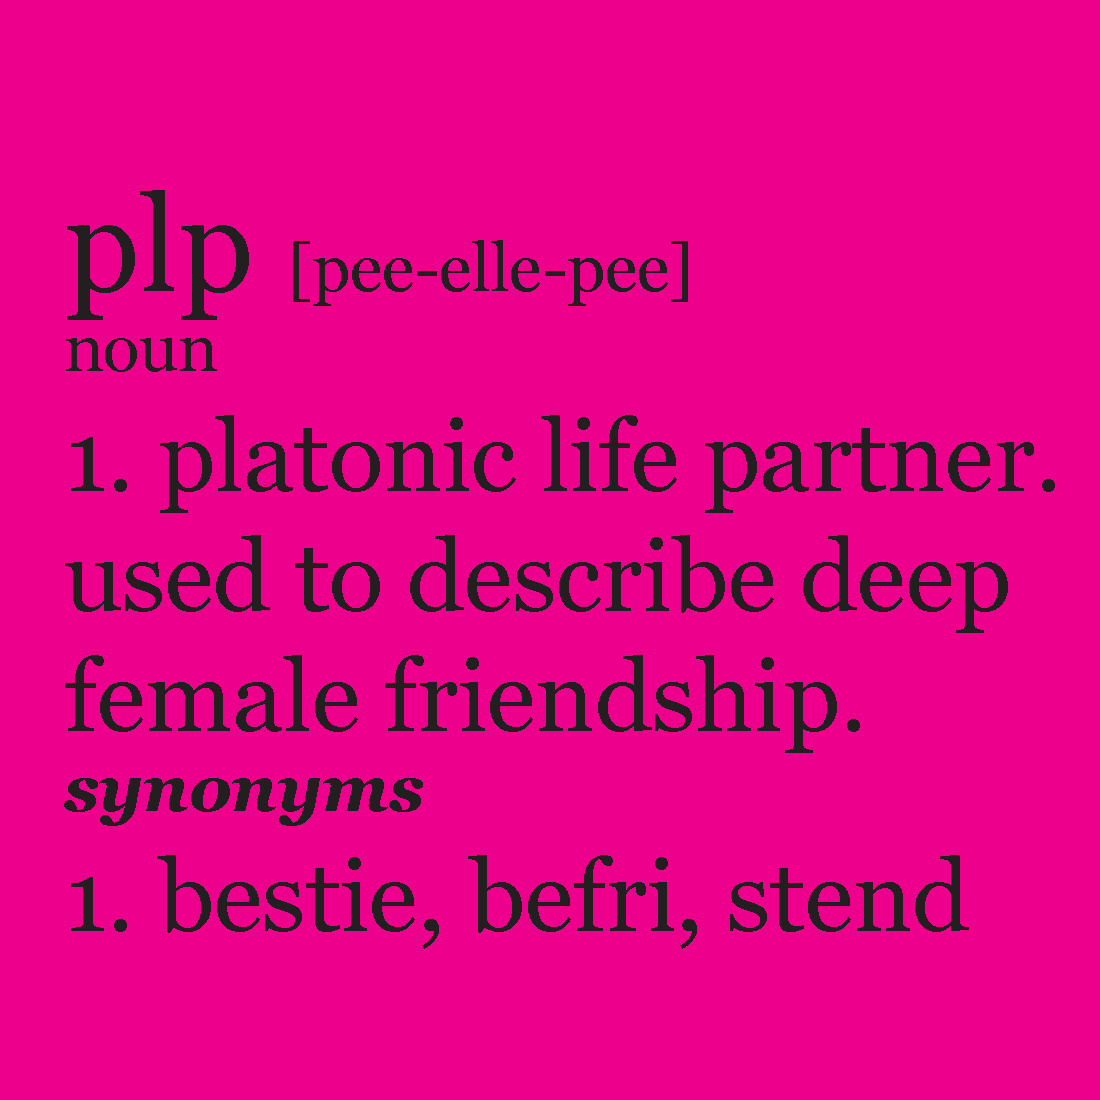 Platonic life partner